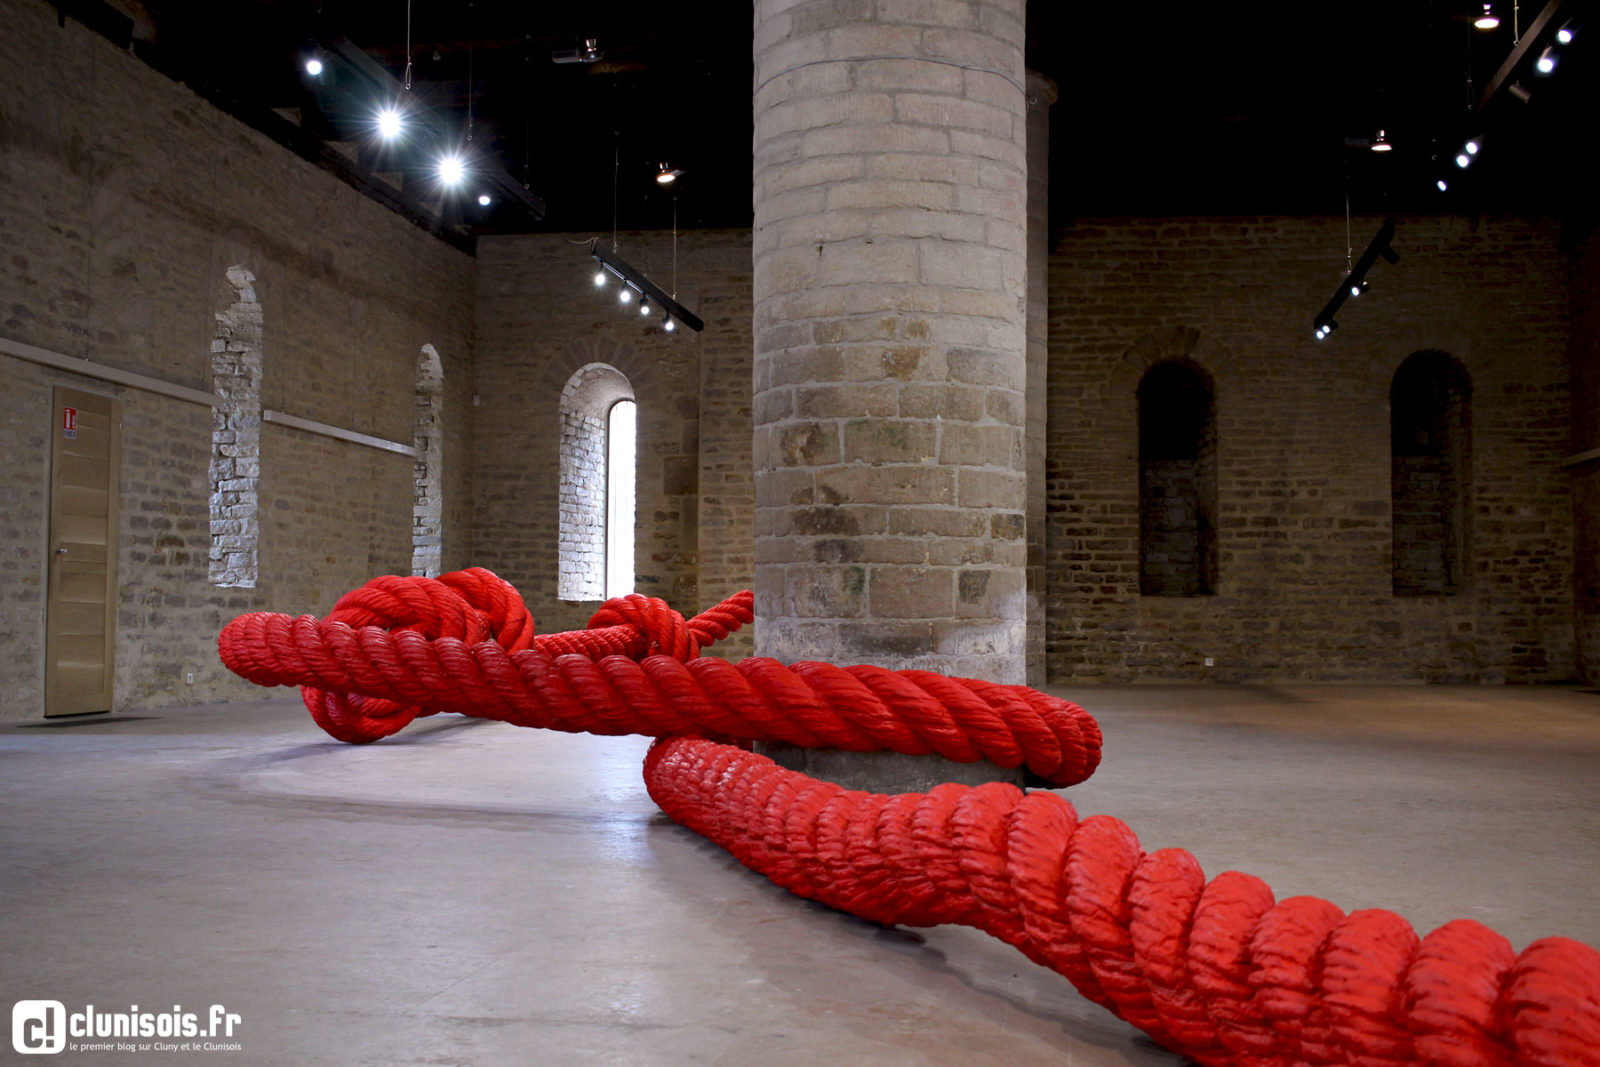 lilian bourgeat filet sculpture installation exposition corde noeuds6 - Lilian Bourgeat, le sculpteur qui voit grand